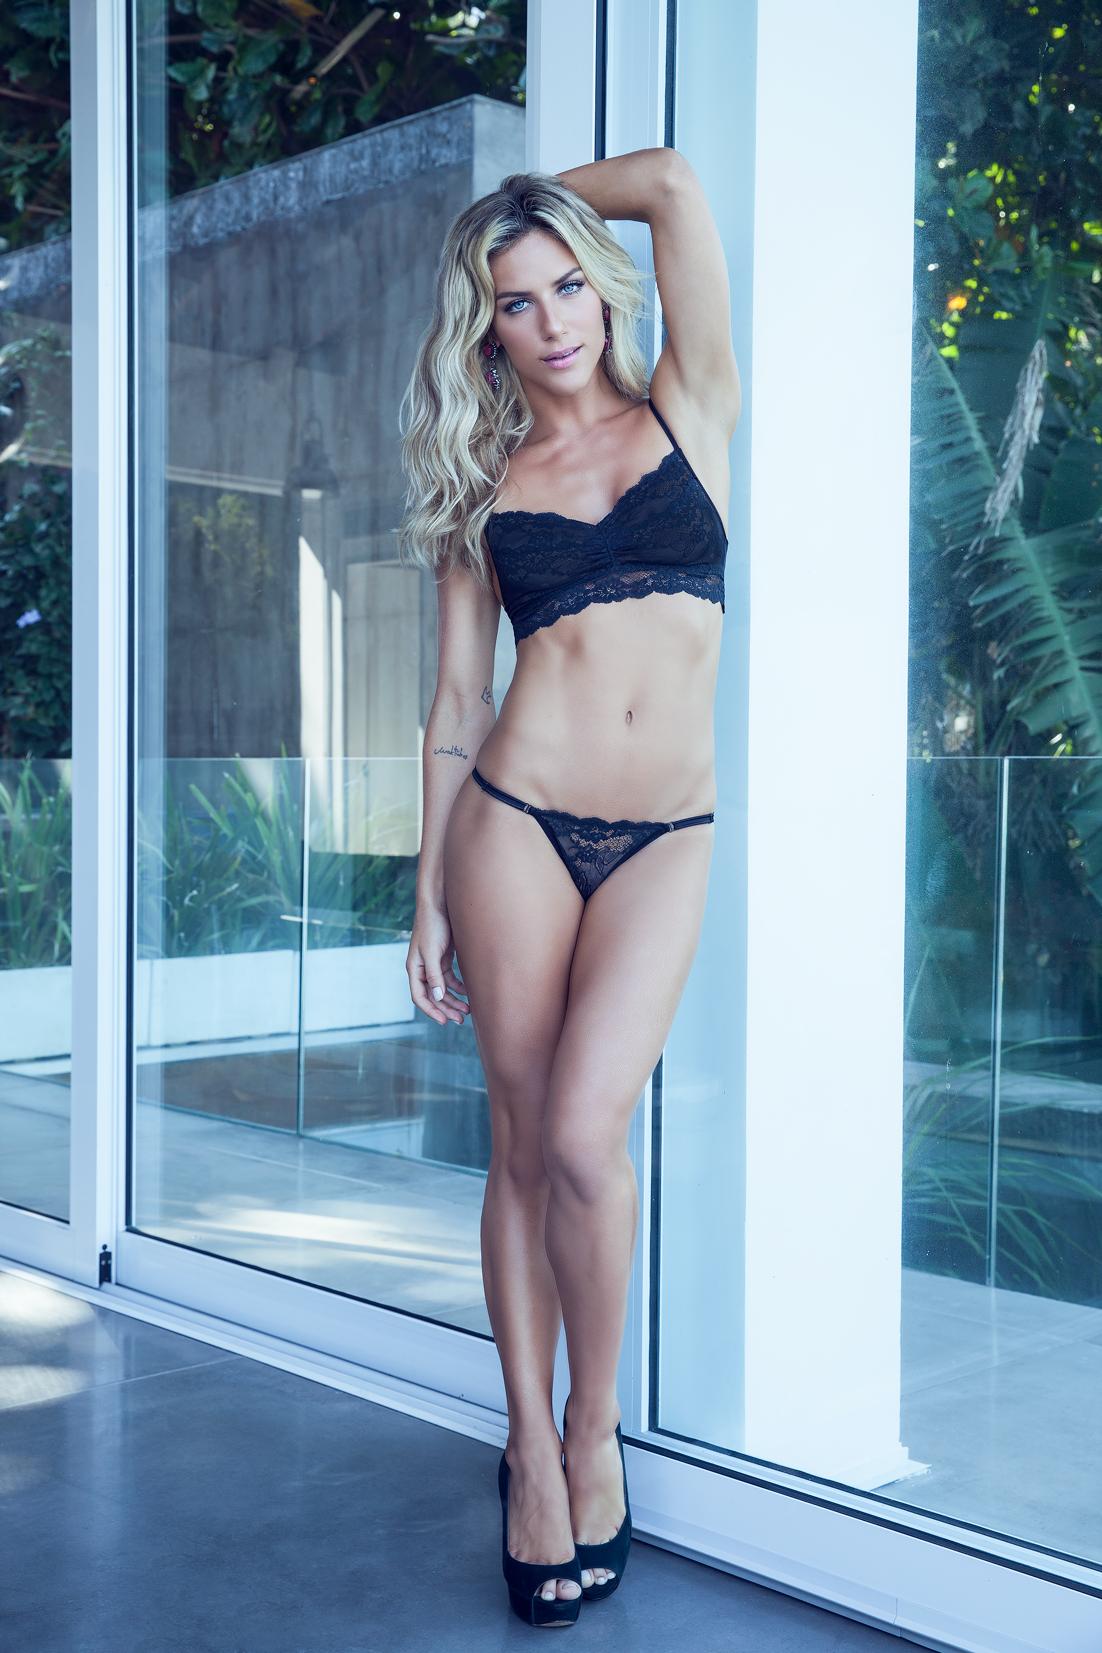 Celebrites Giovanna Ewbank nude (29 photo), Ass, Bikini, Twitter, butt 2015